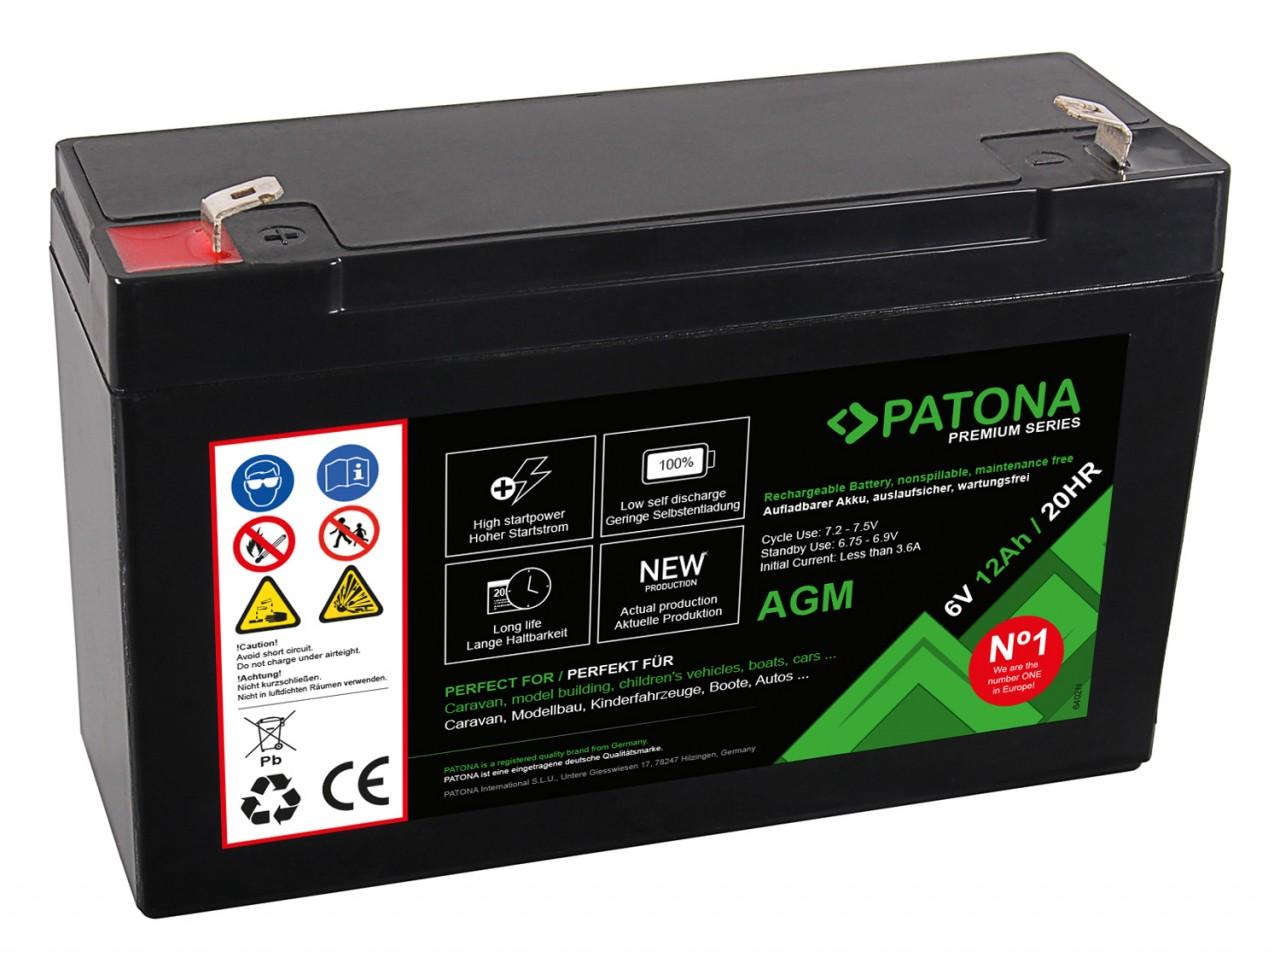 PATONA Premium AGM Lead Battery 6V 12Ah 20HR